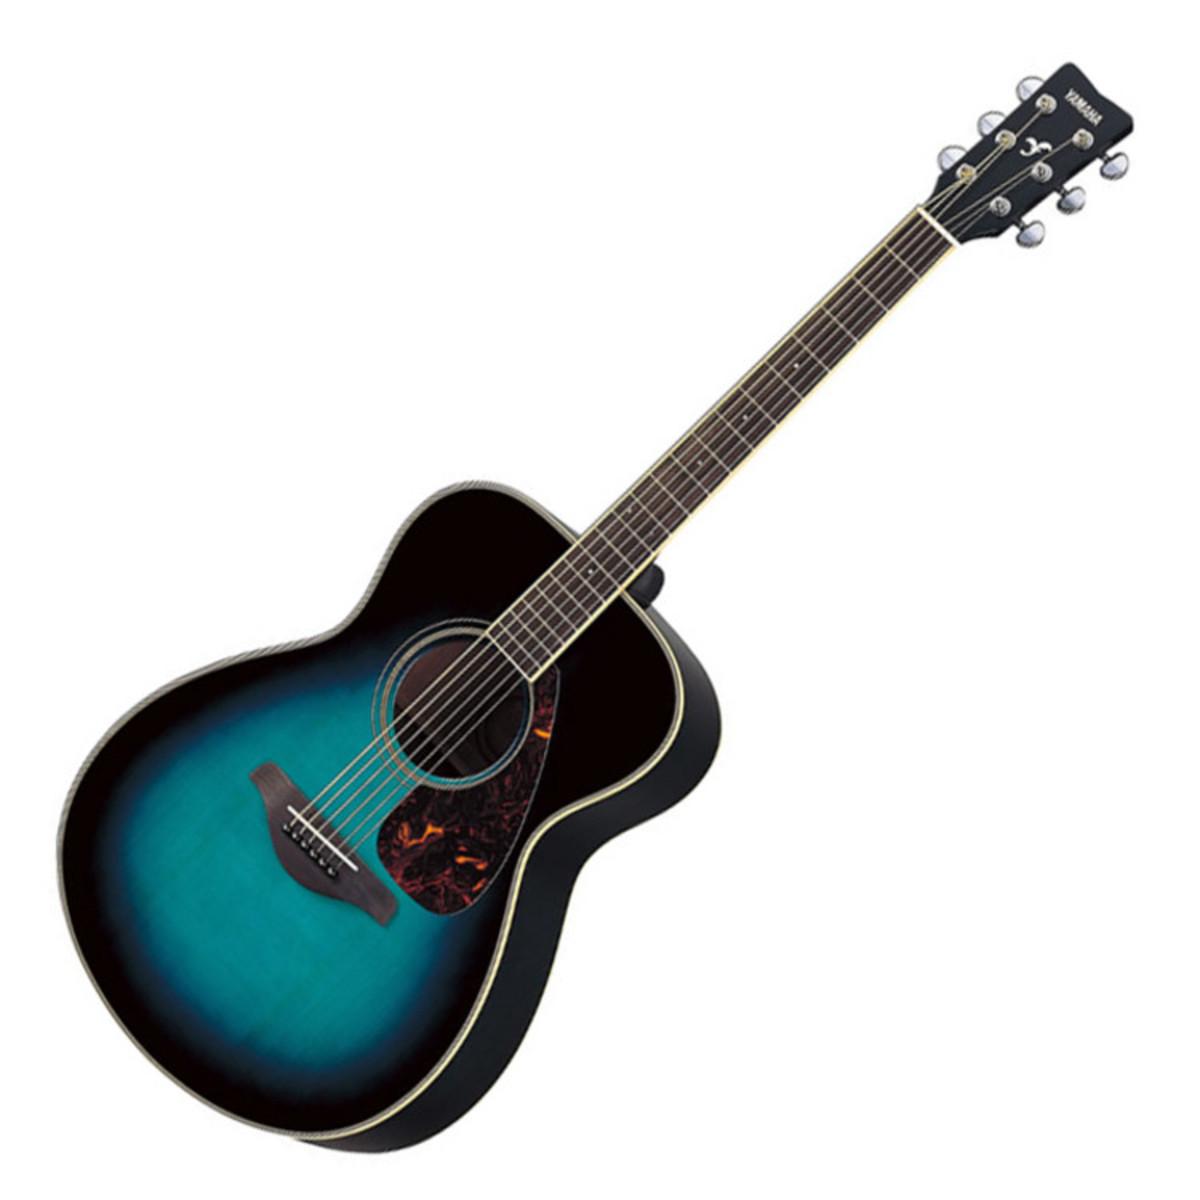 guitare electro acoustique de disque yamaha fgx720sca. Black Bedroom Furniture Sets. Home Design Ideas